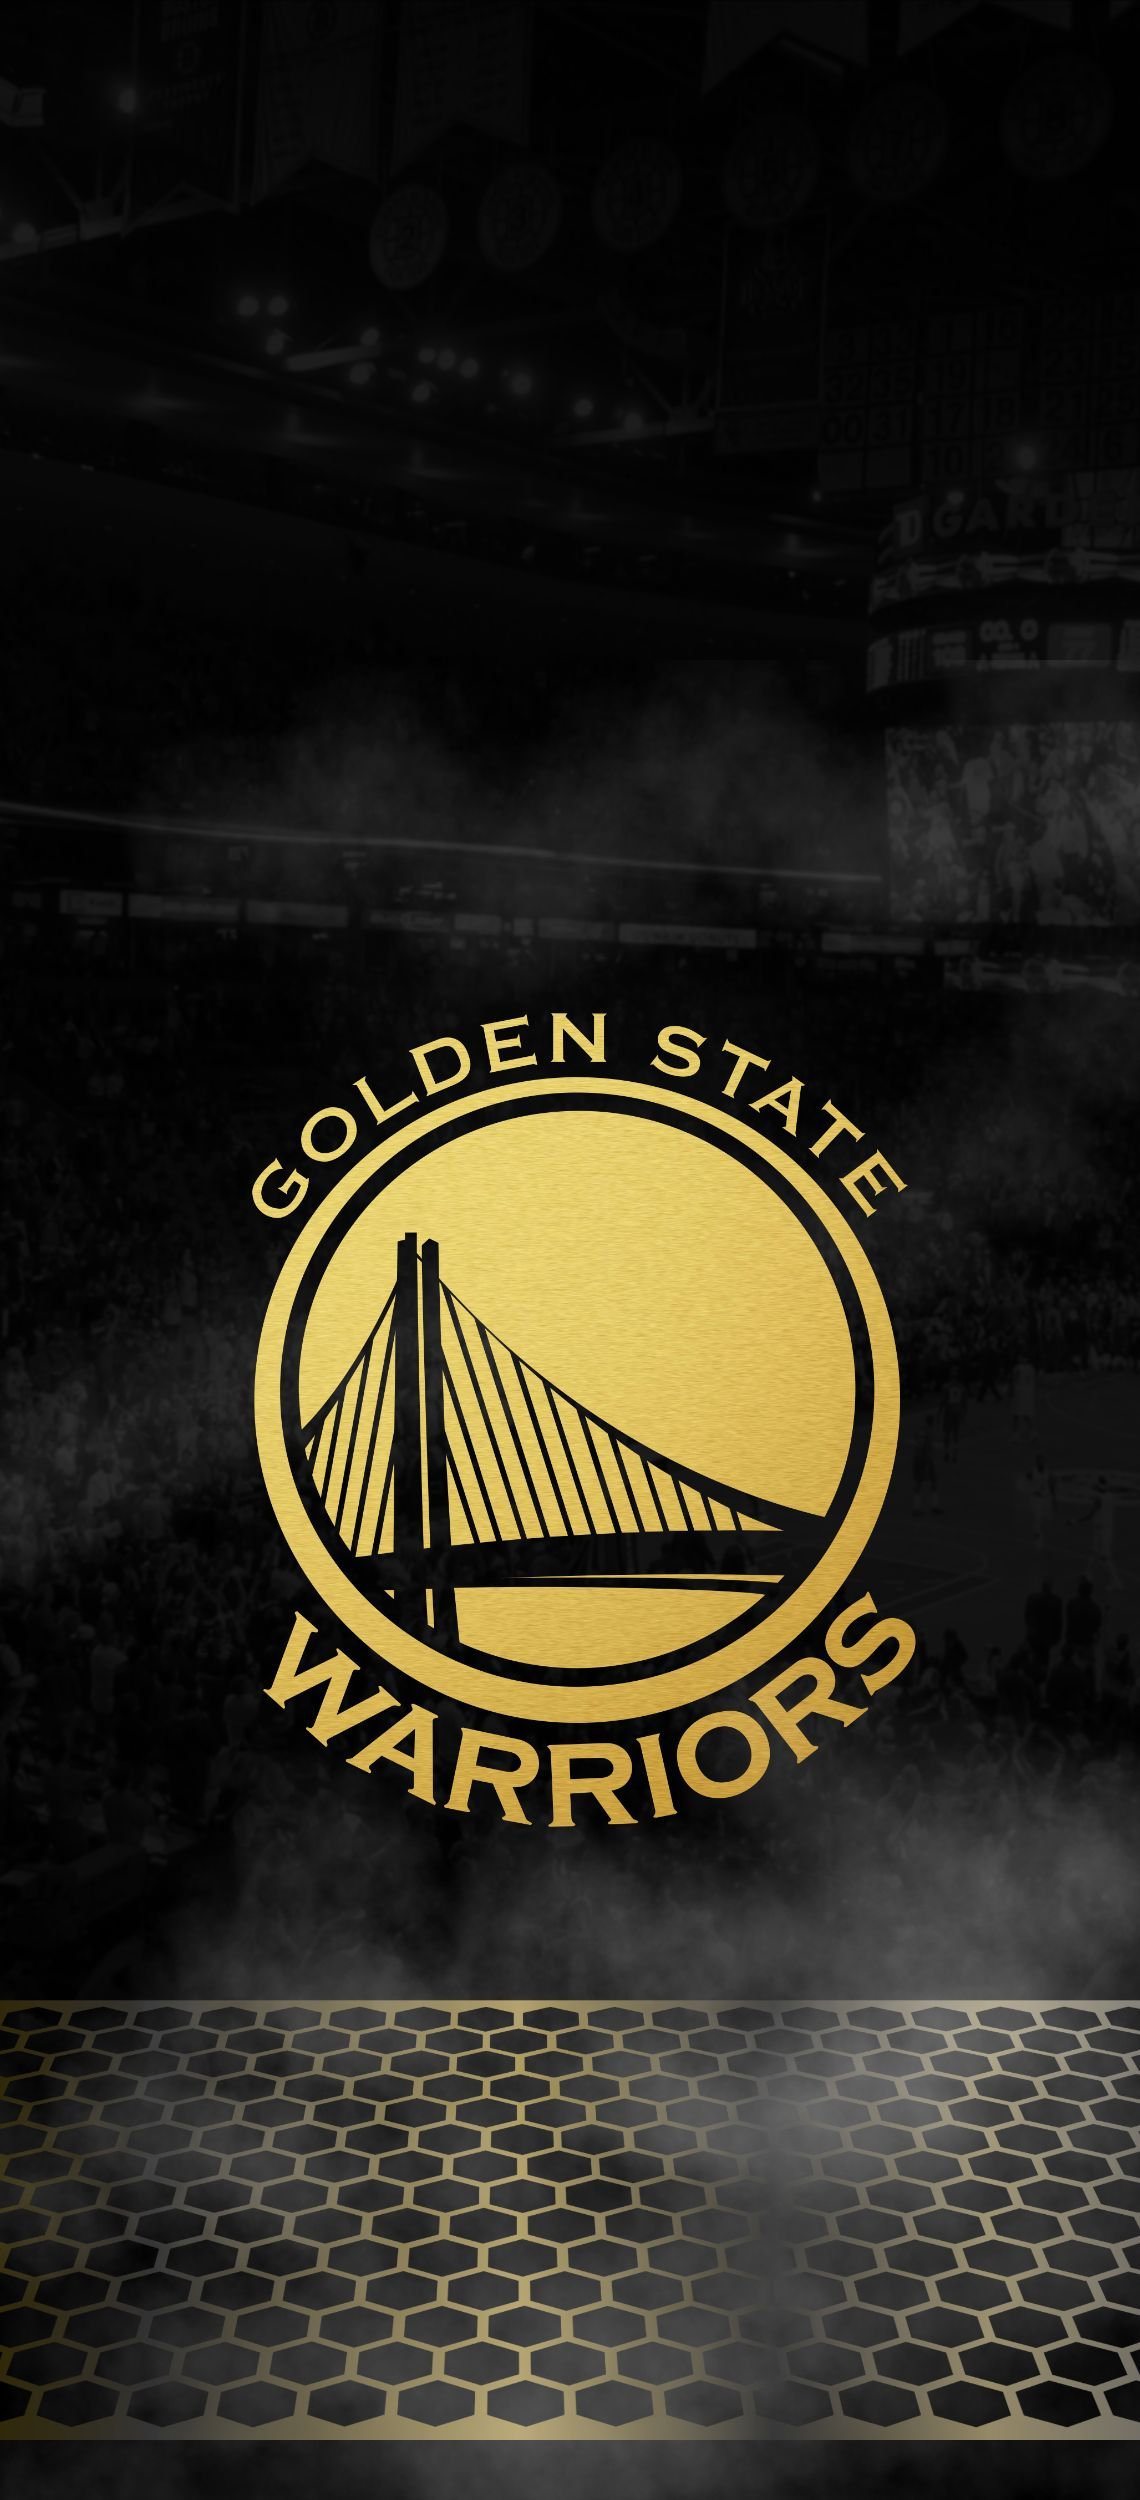 Golden State Warriors Wallpaper Background Golden State Warriors Wallpaper Warriors Wallpaper Golden State Warriors